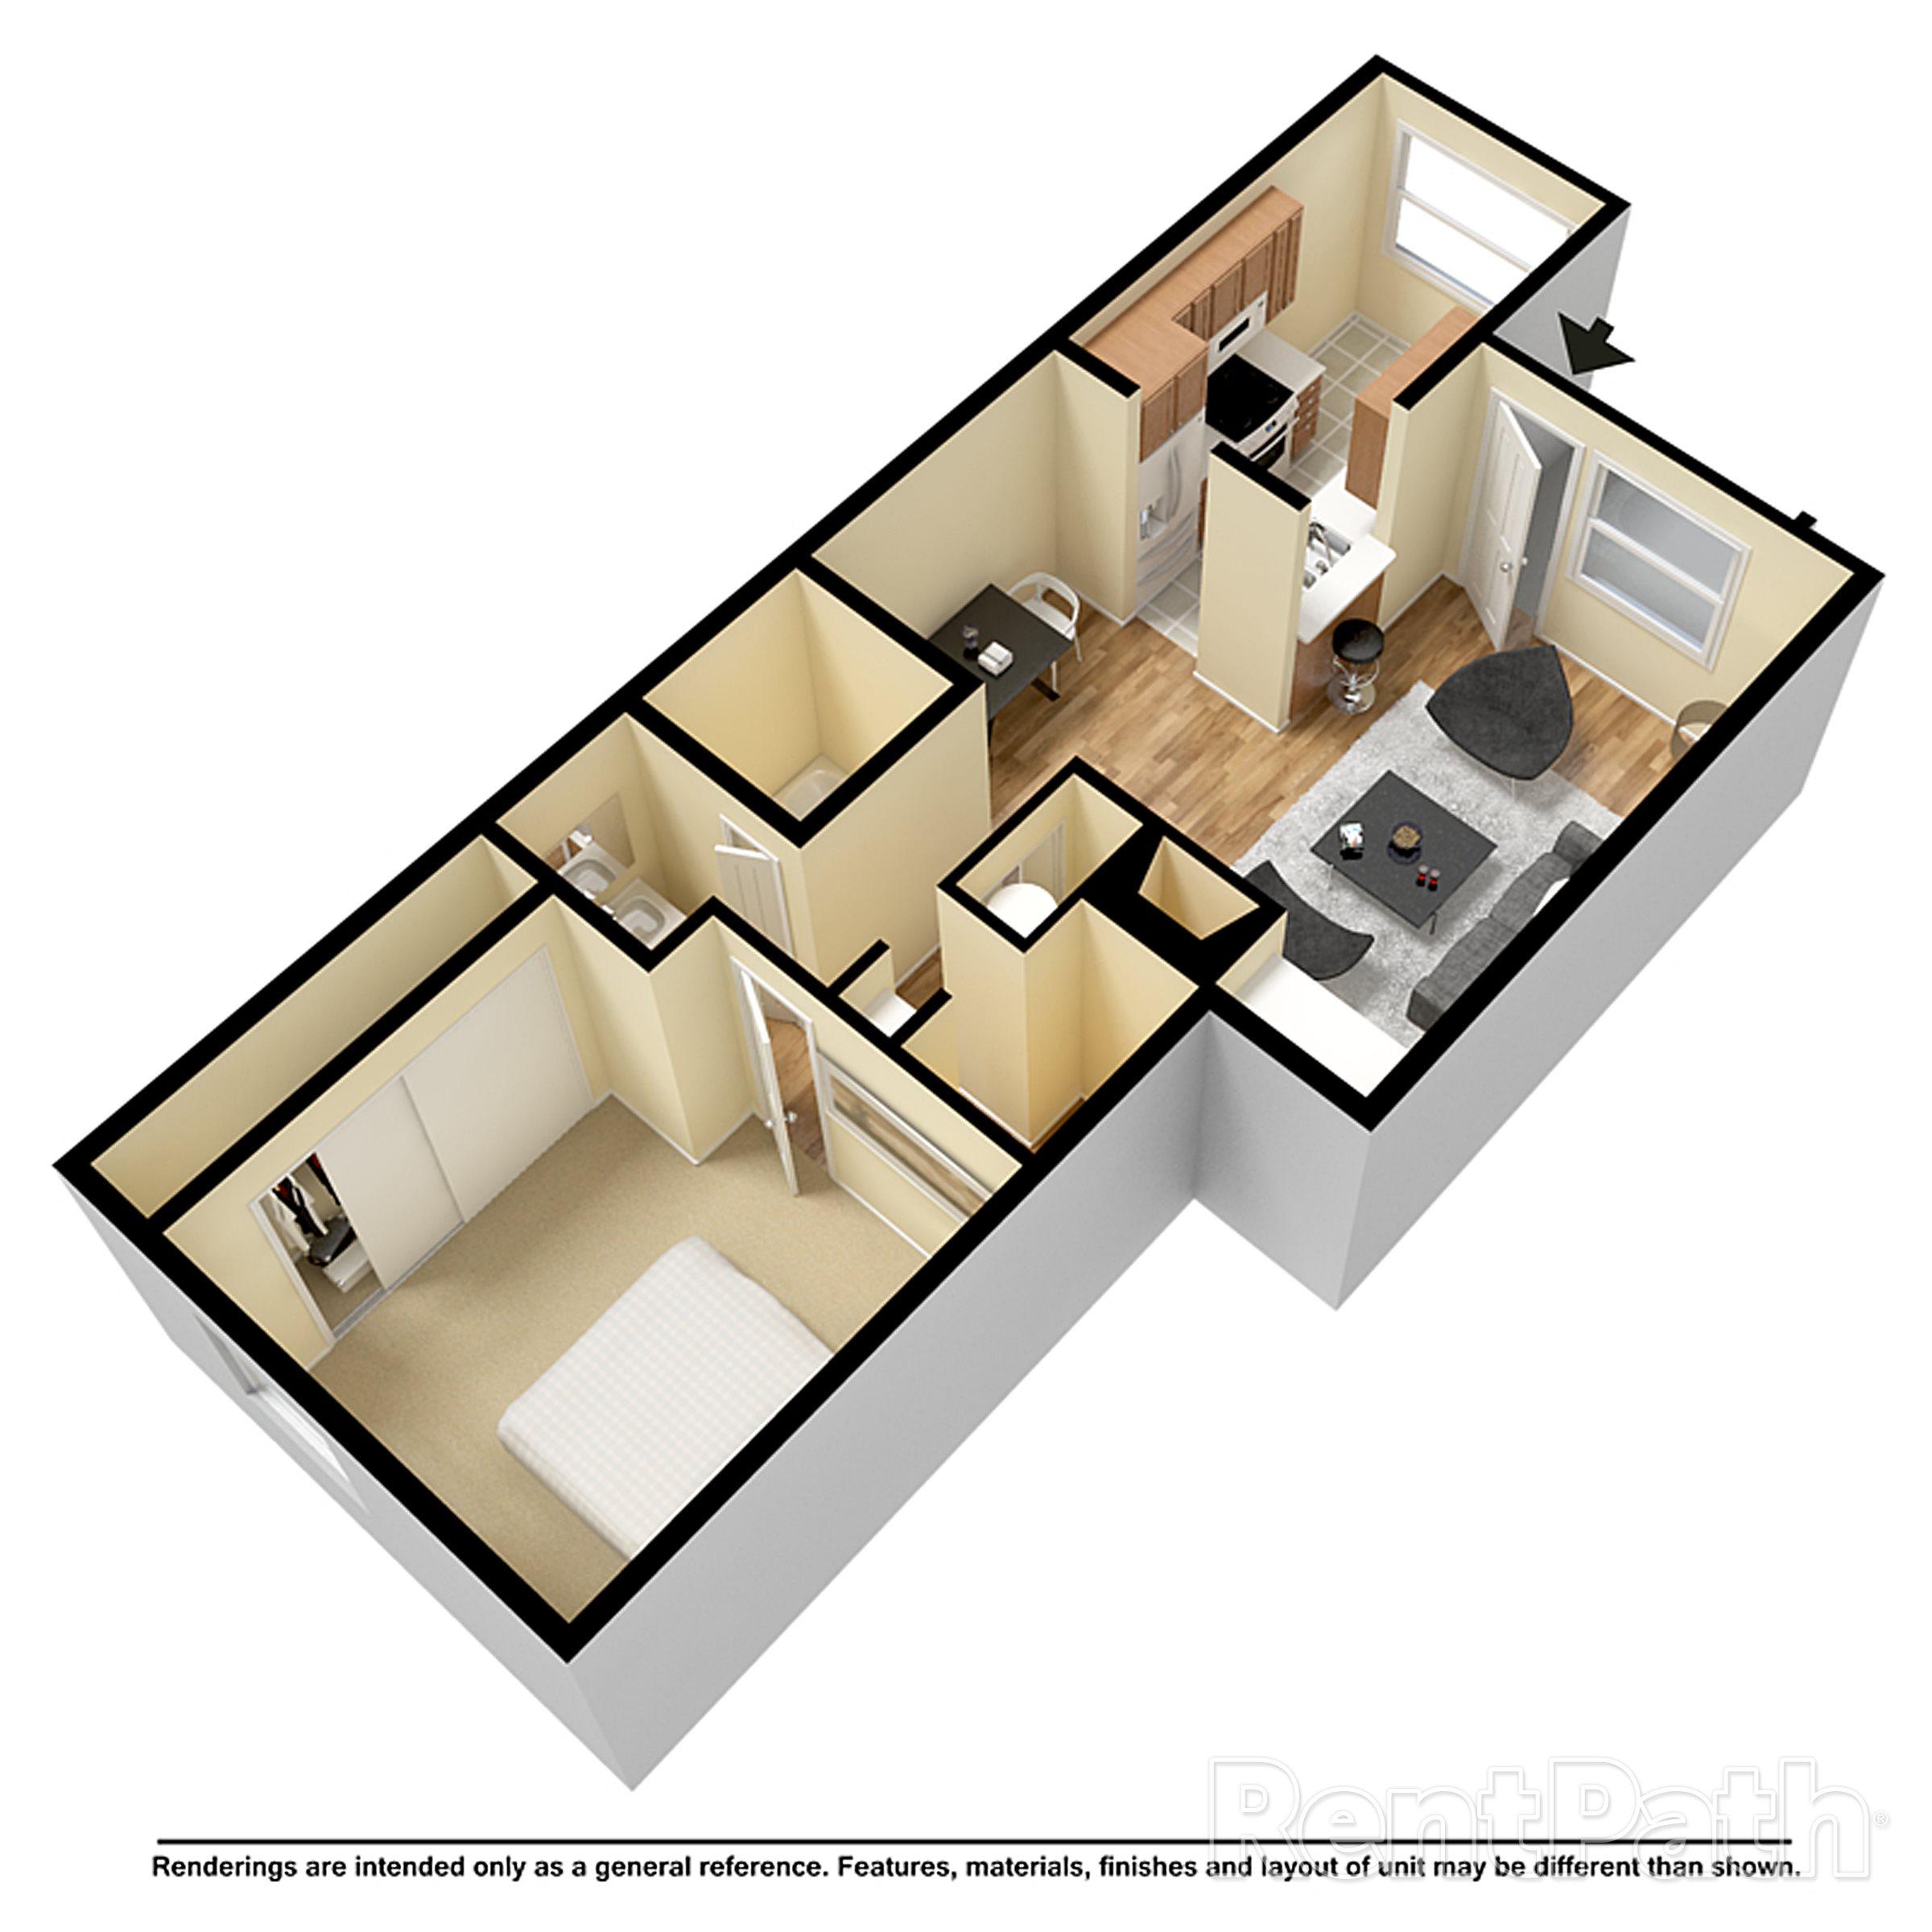 Mesa Village Apartments: Floor Plans Of Woodstream Village In Mesa, AZ